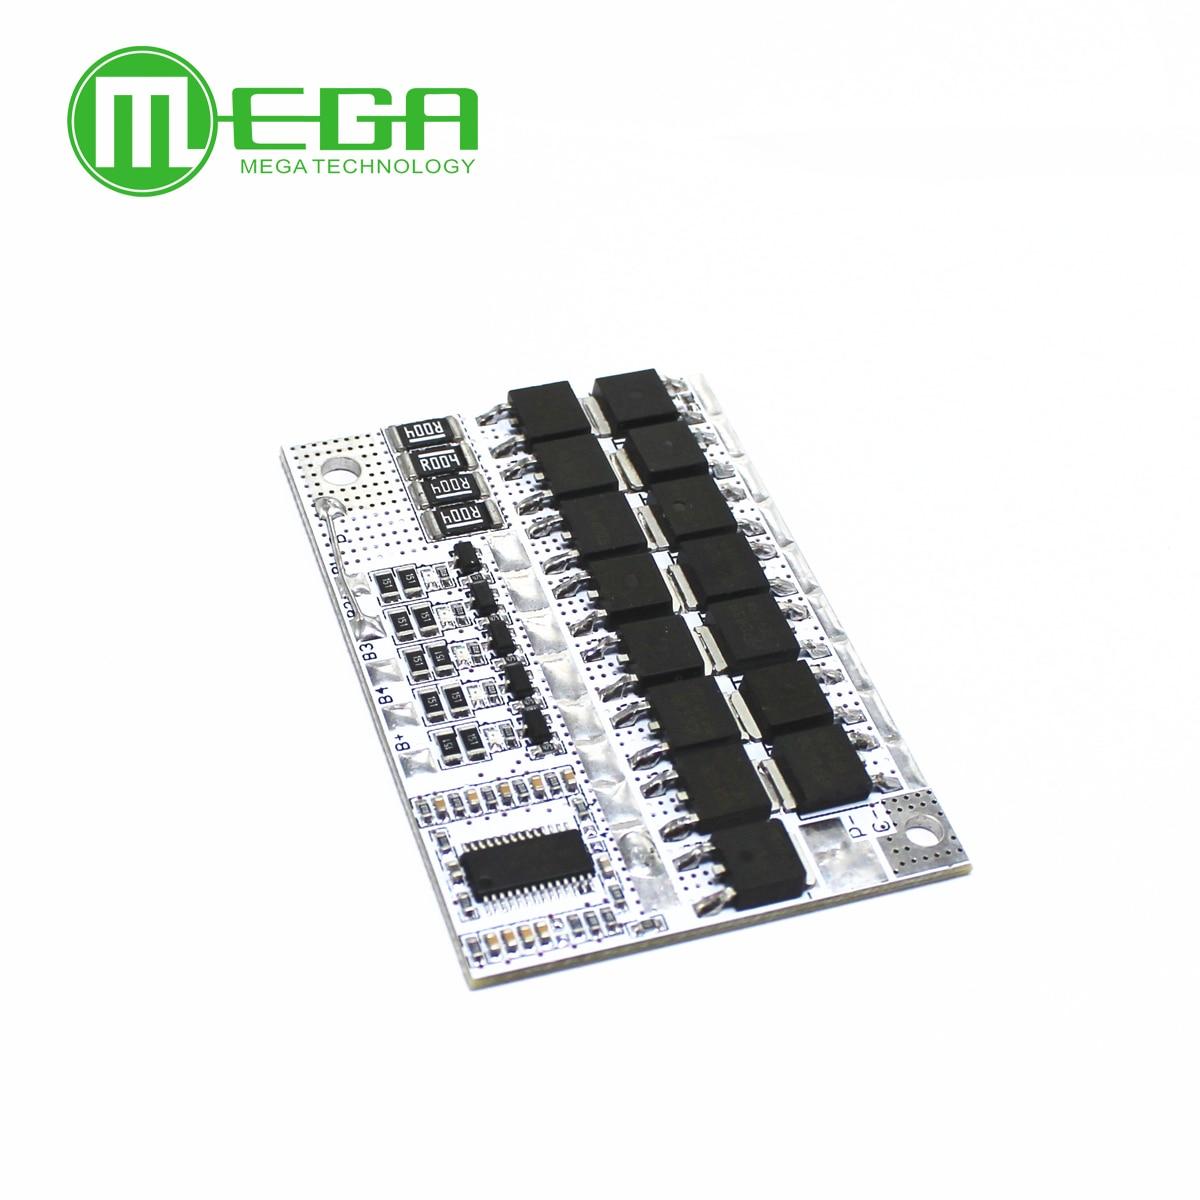 4S 3S, 5S, 12V, 16,8 V, 21V, 100A, protección de la batería de litio LMO ternaria, placa de circuito de litio, módulo de placa de carga de equilibrio de polímero de litio